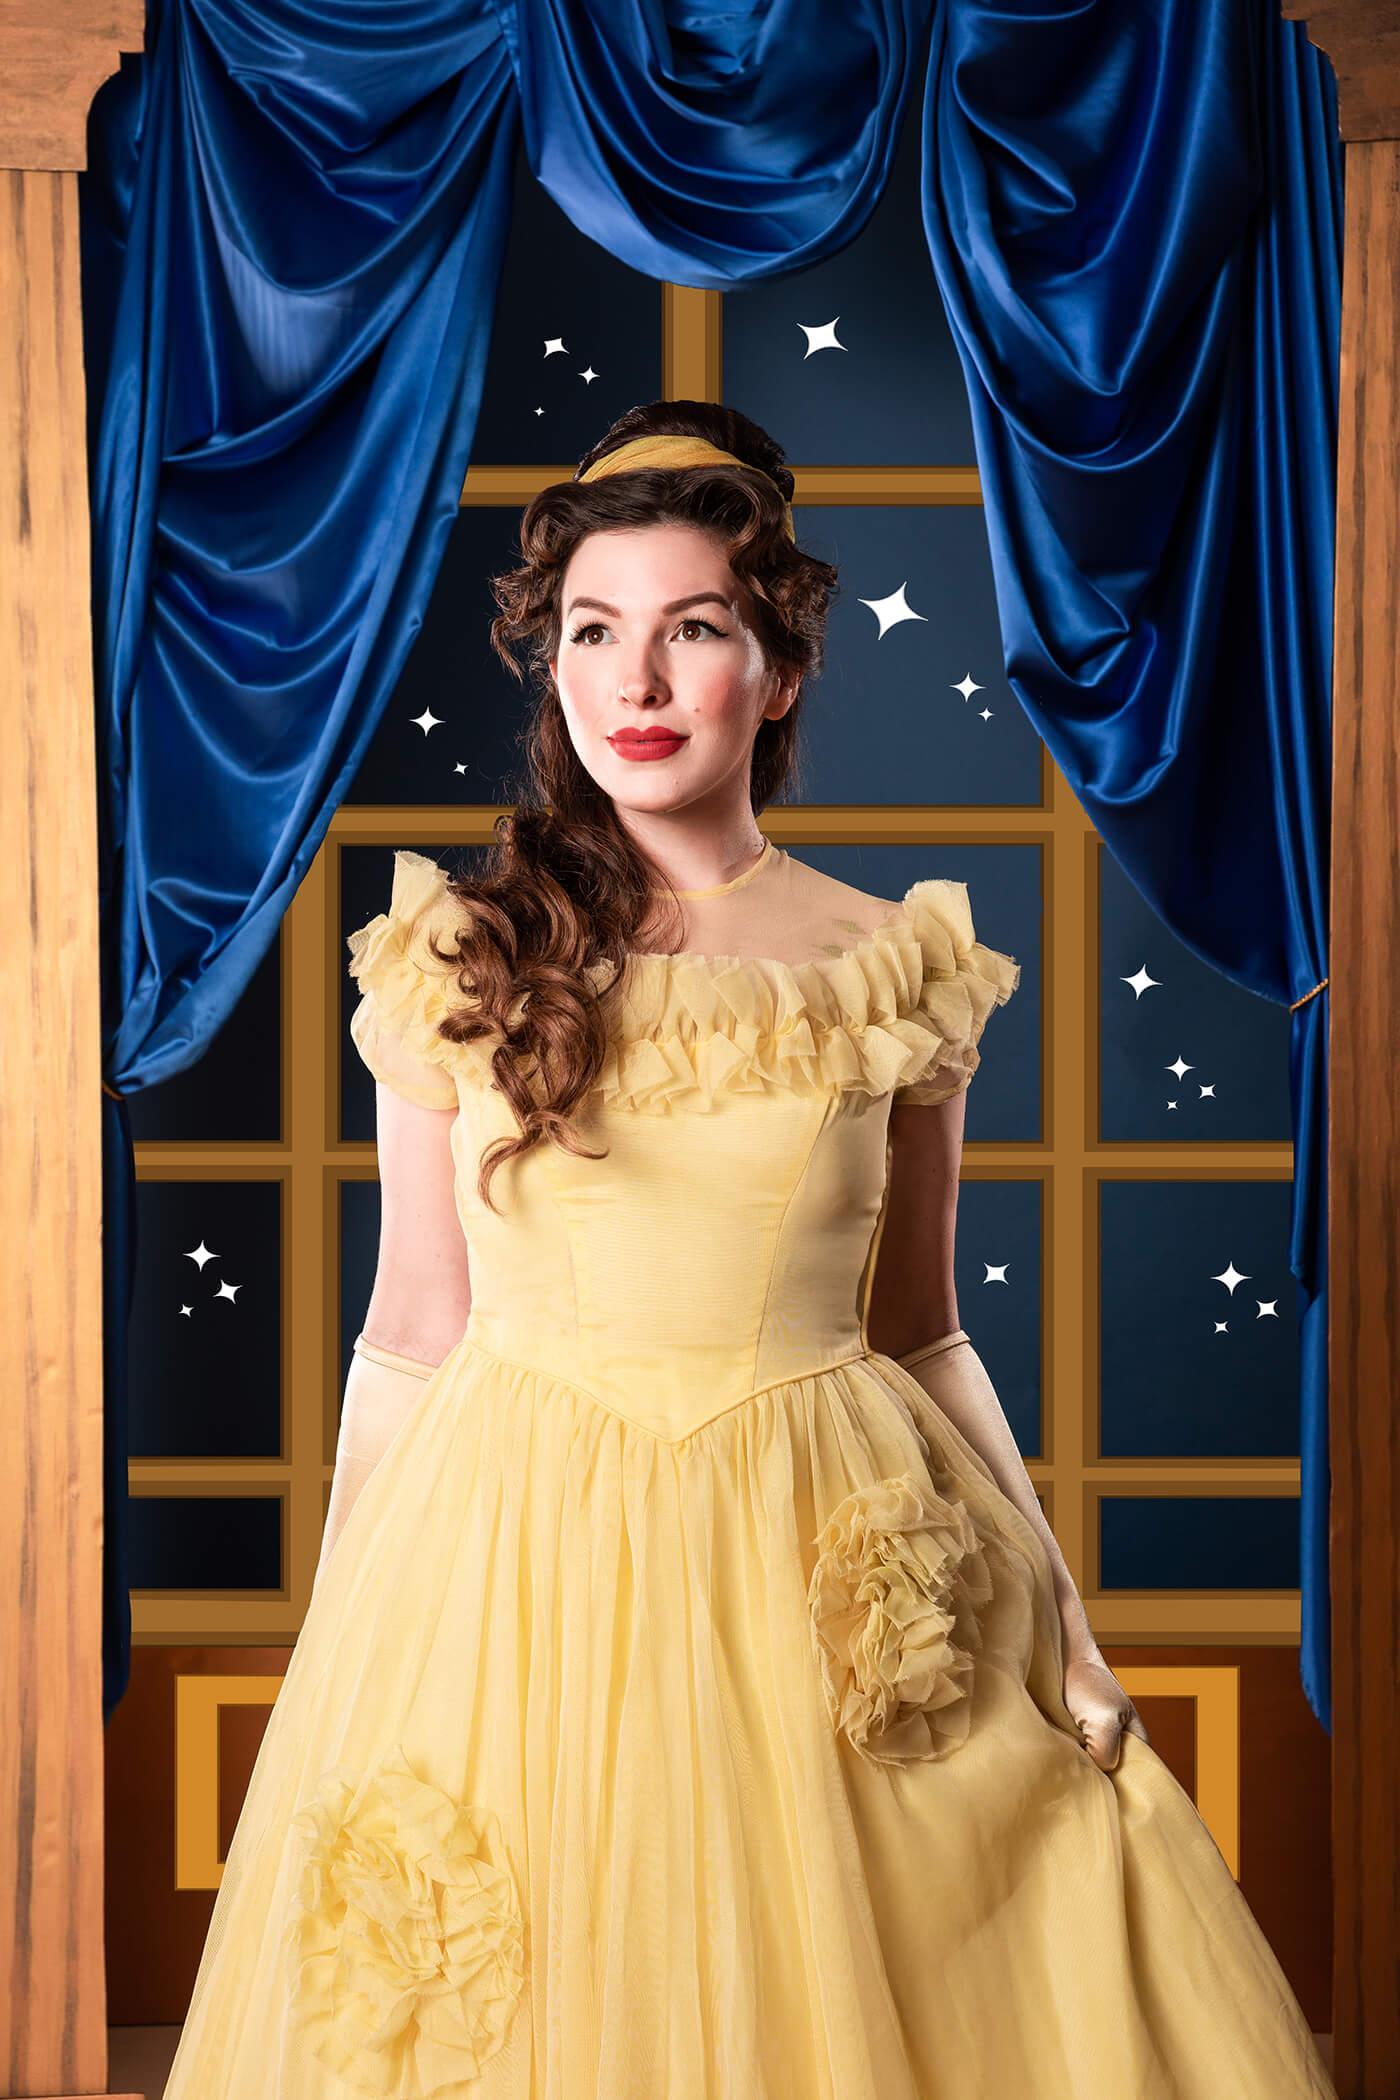 belle disney halloween costume keiko lynn